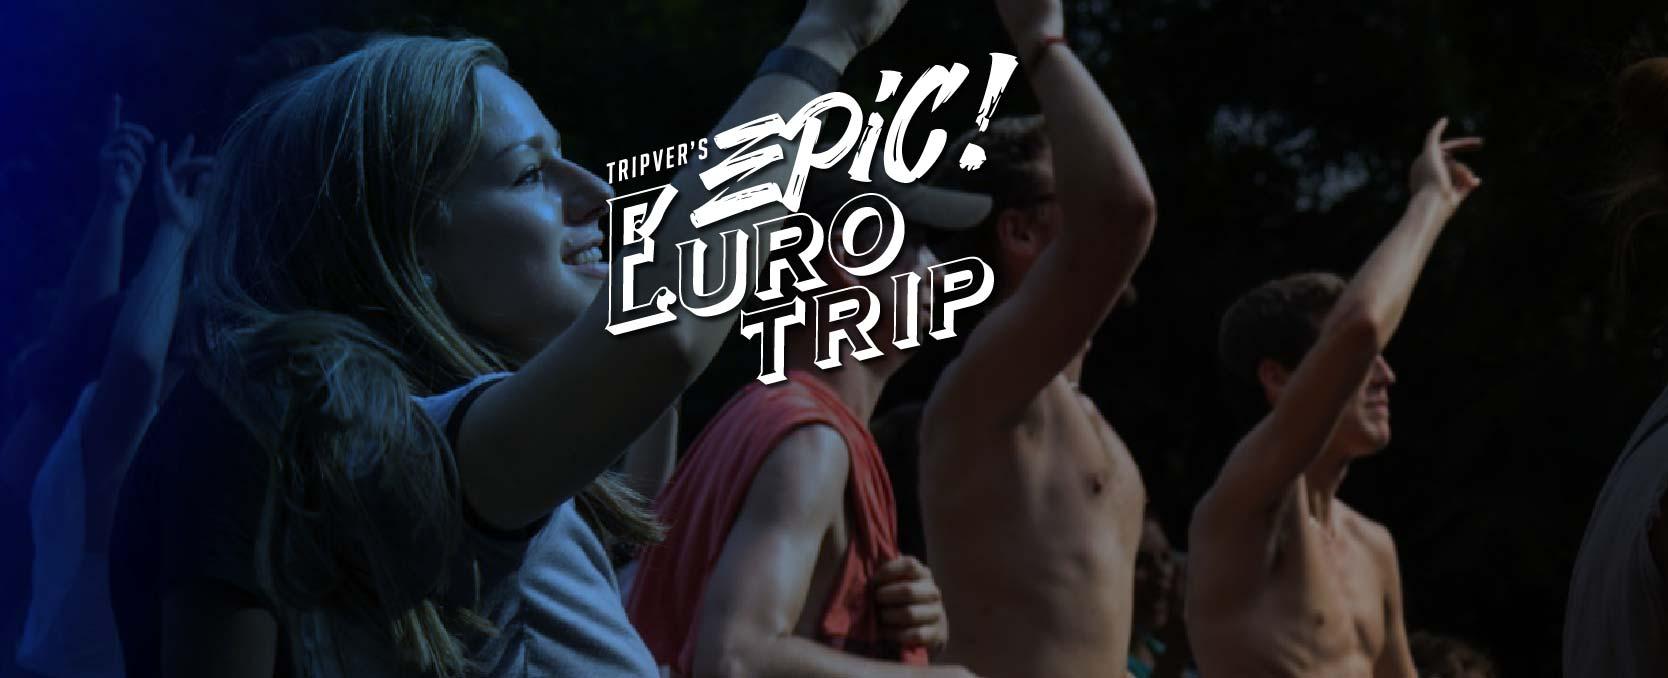 epic-euro-trip